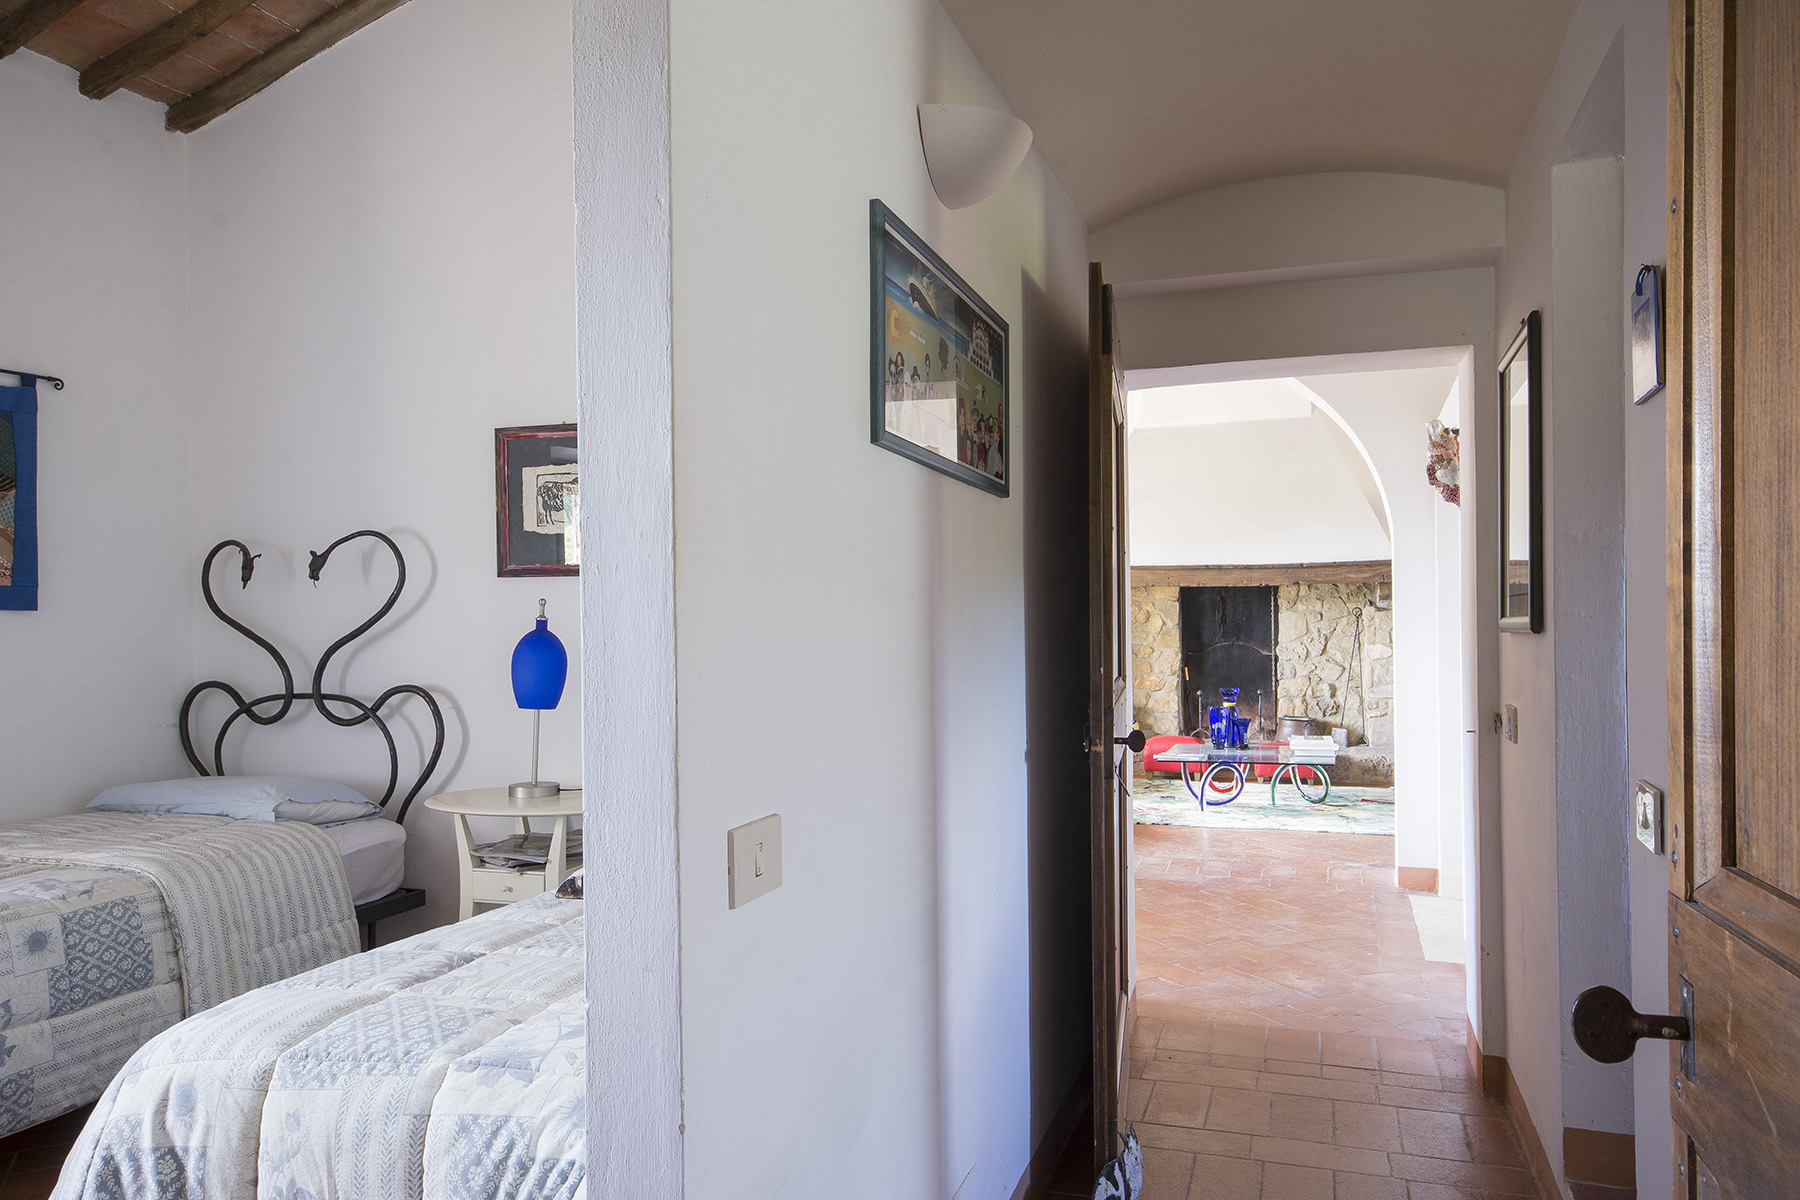 Casa indipendente in Vendita a Pienza: 5 locali, 400 mq - Foto 22